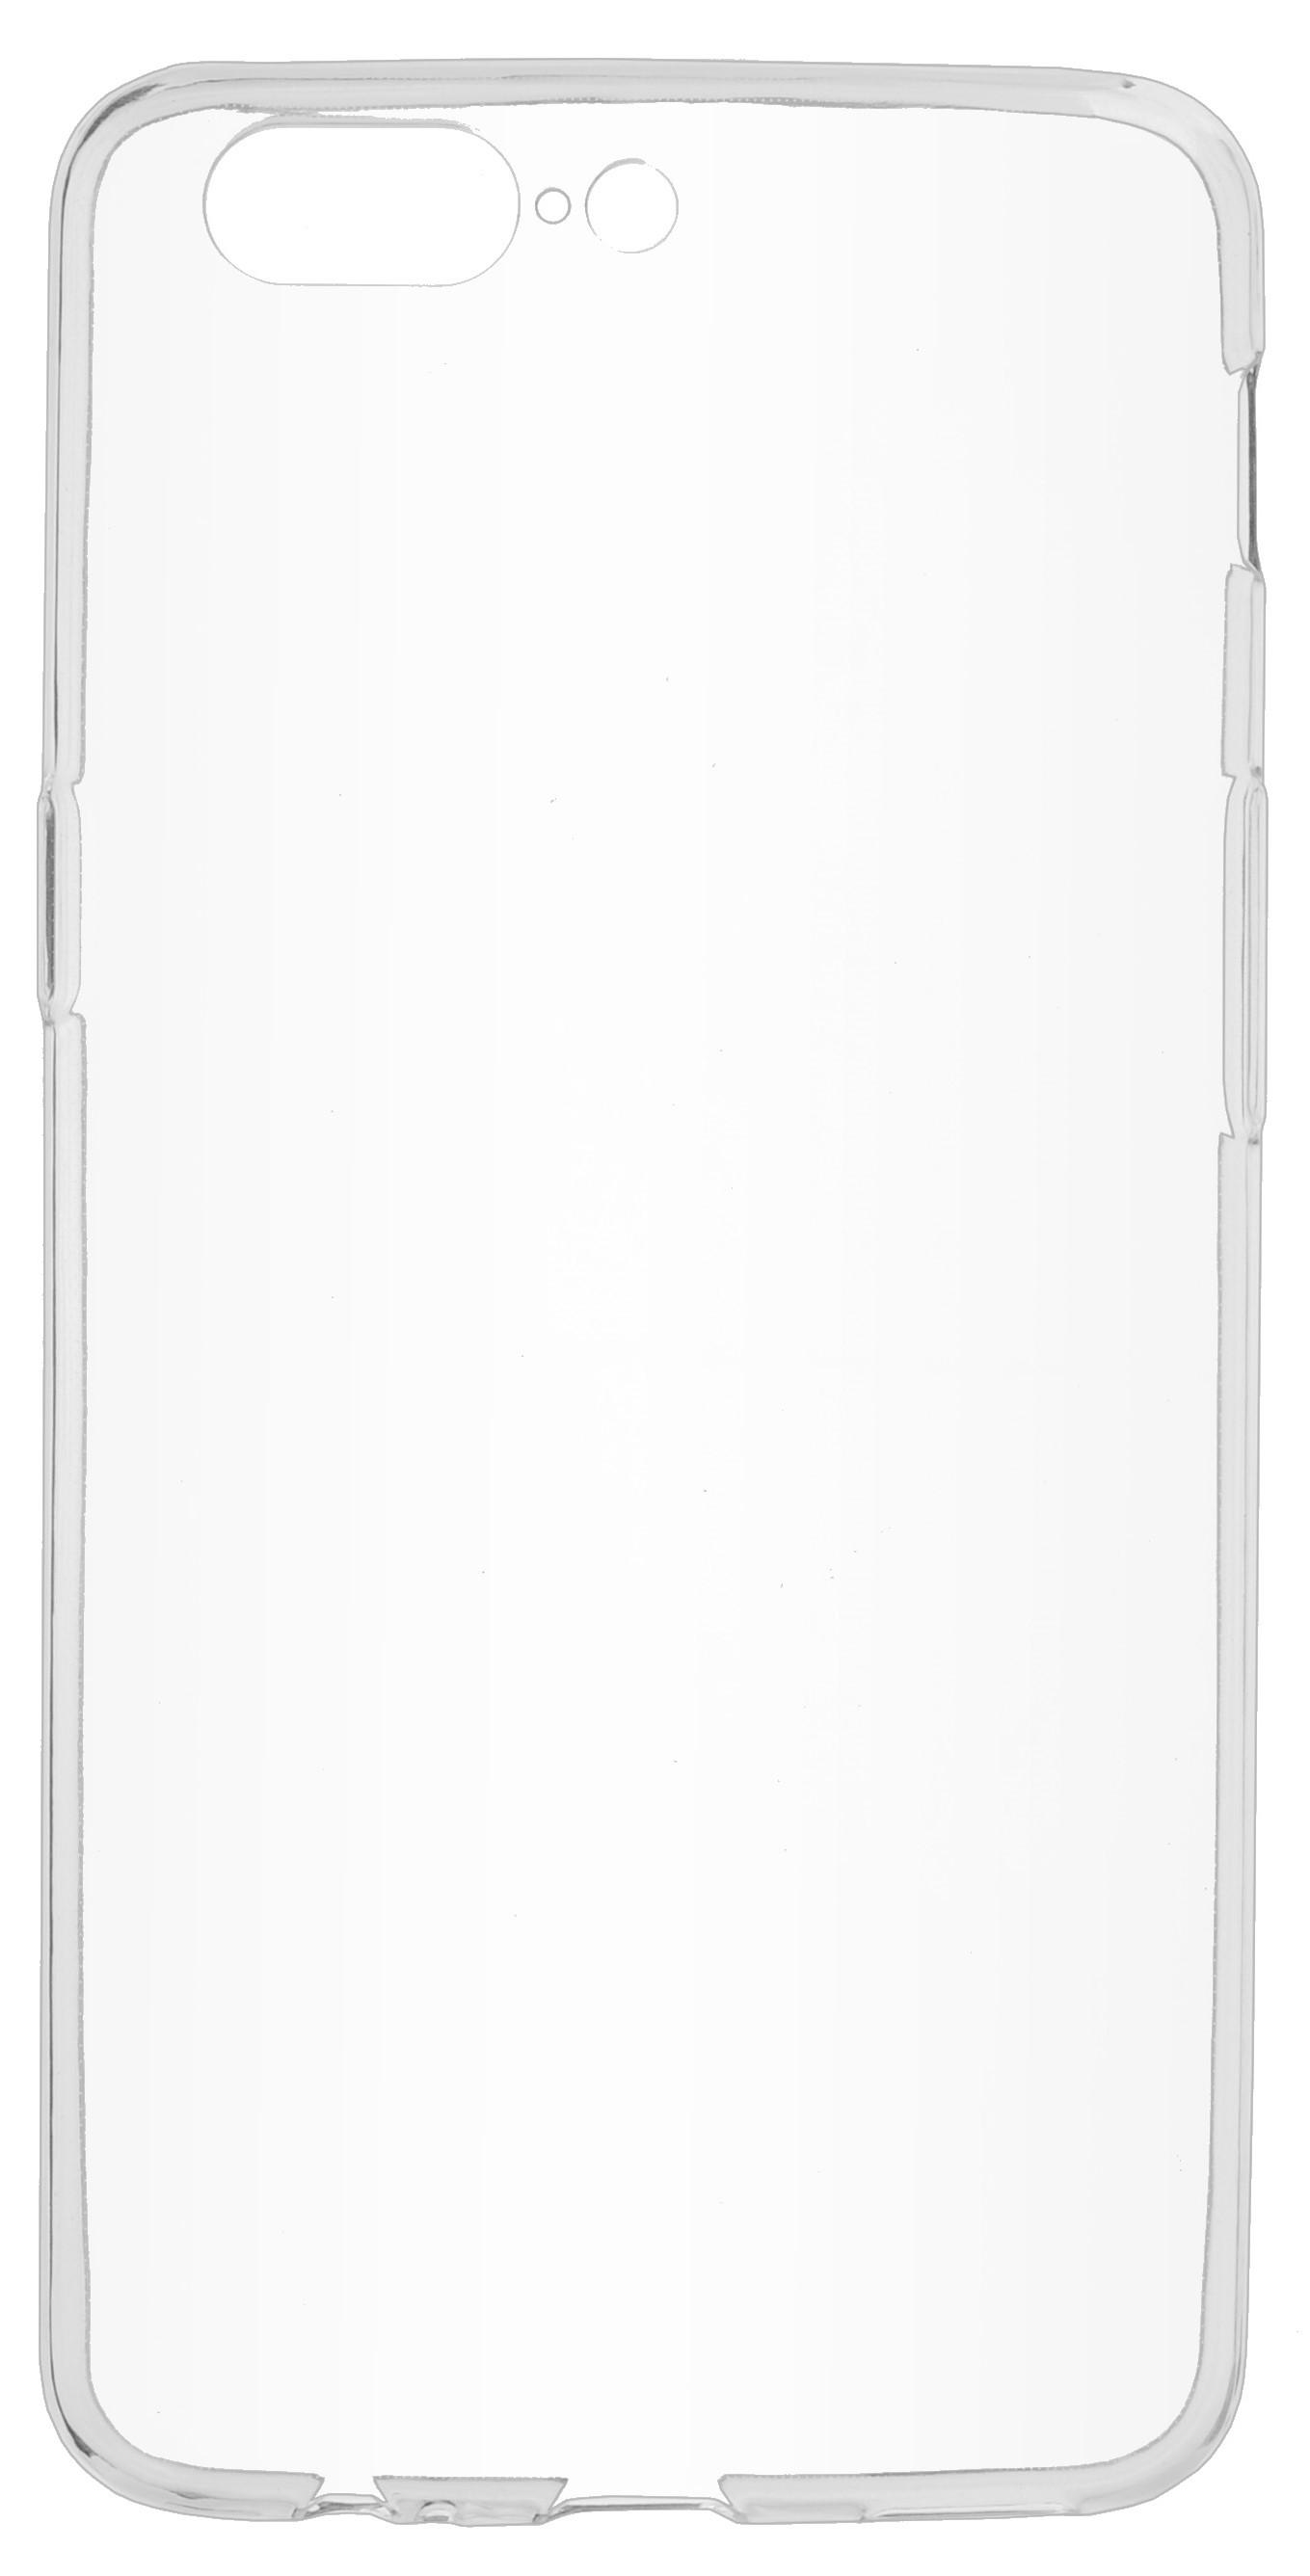 Чехол для сотового телефона skinBOX Slim Silicone, 4630042529847, прозрачный цены онлайн